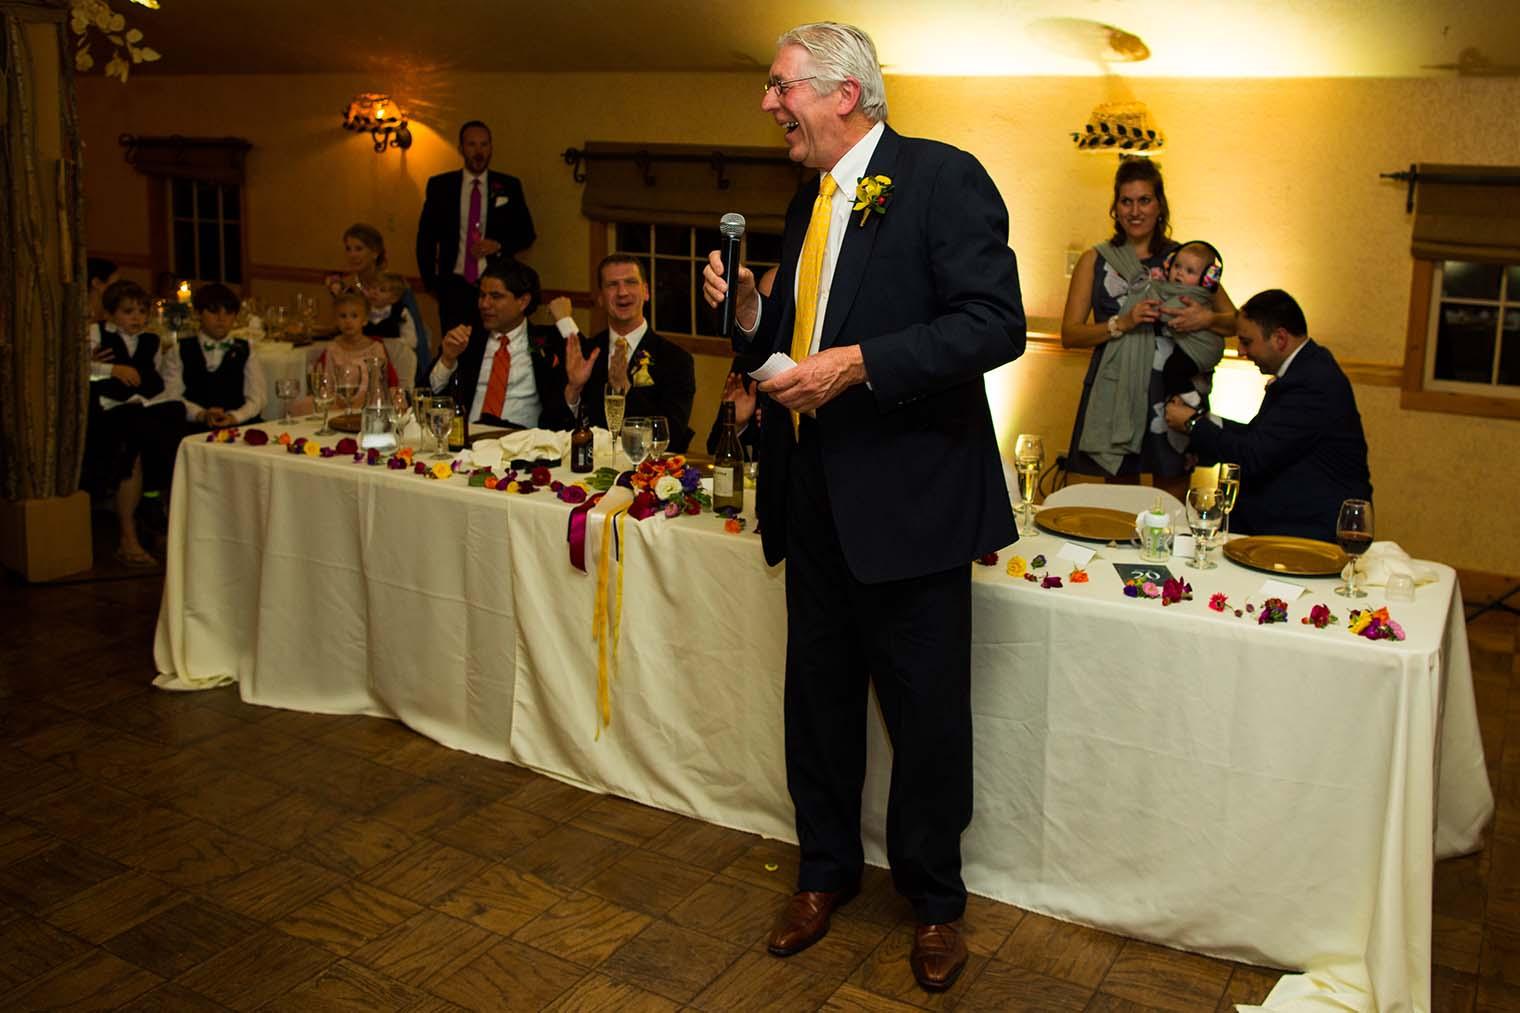 Union Hill Inn Wedding Toasts